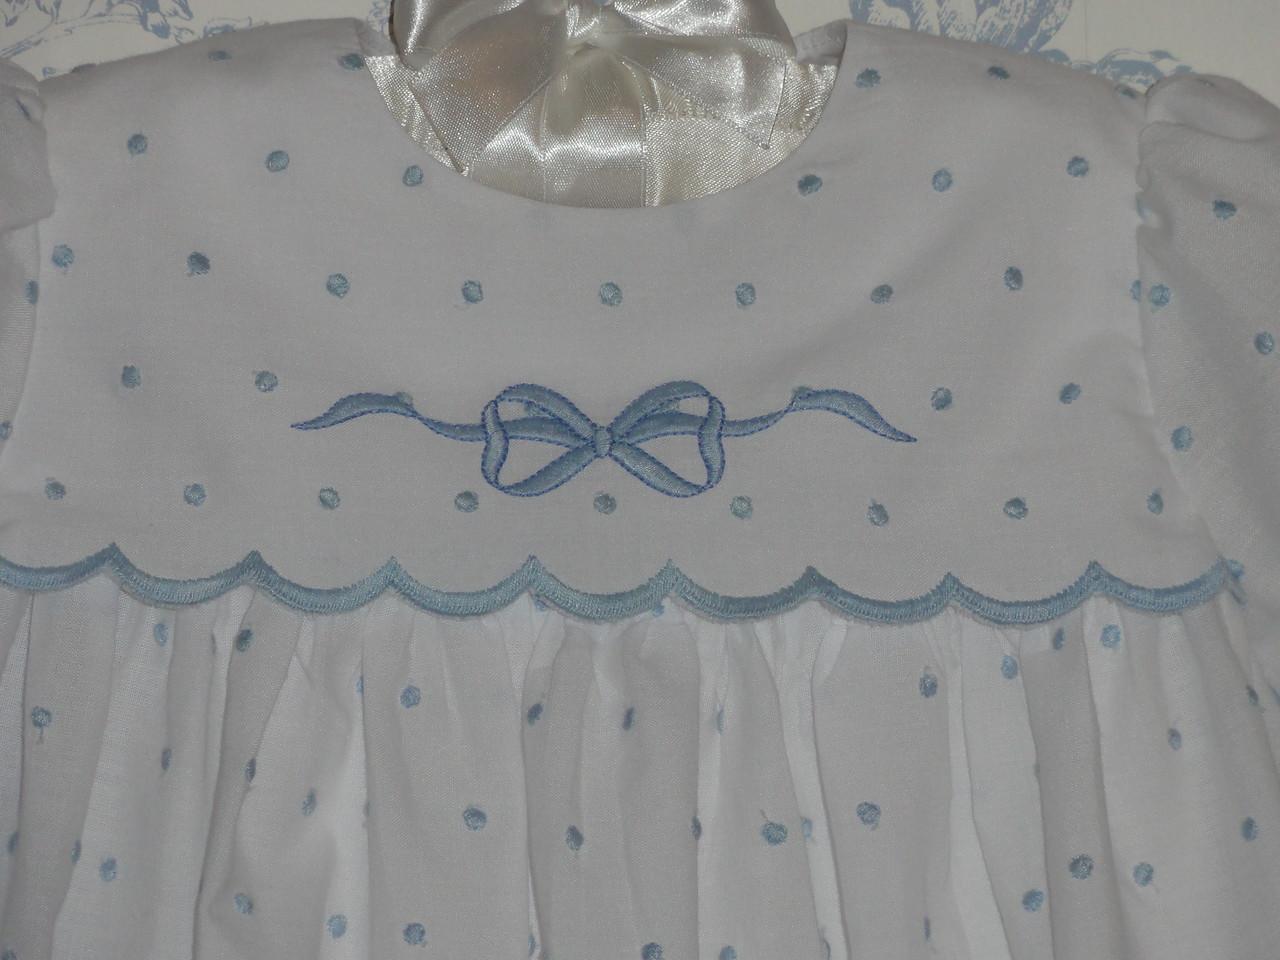 Closeup of yoke overlay